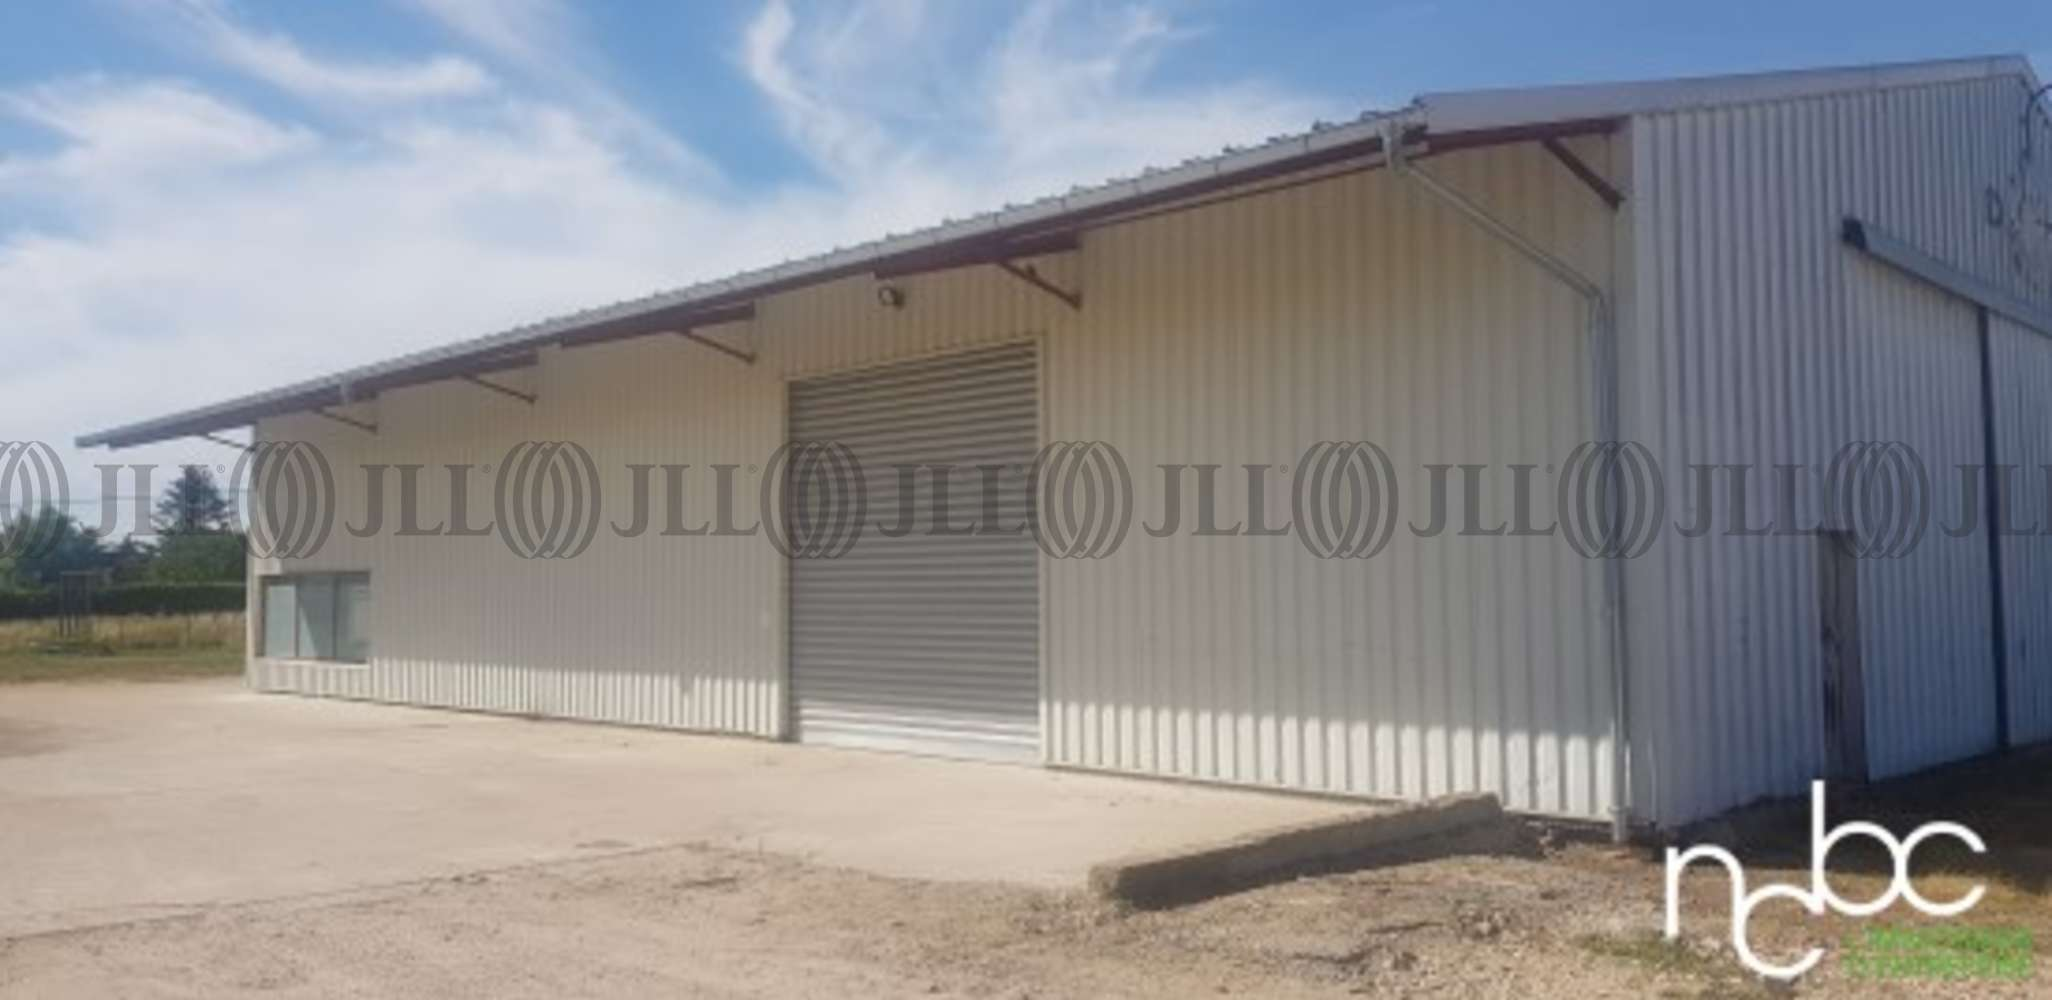 Activités/entrepôt Chatenoy en bresse, 71380